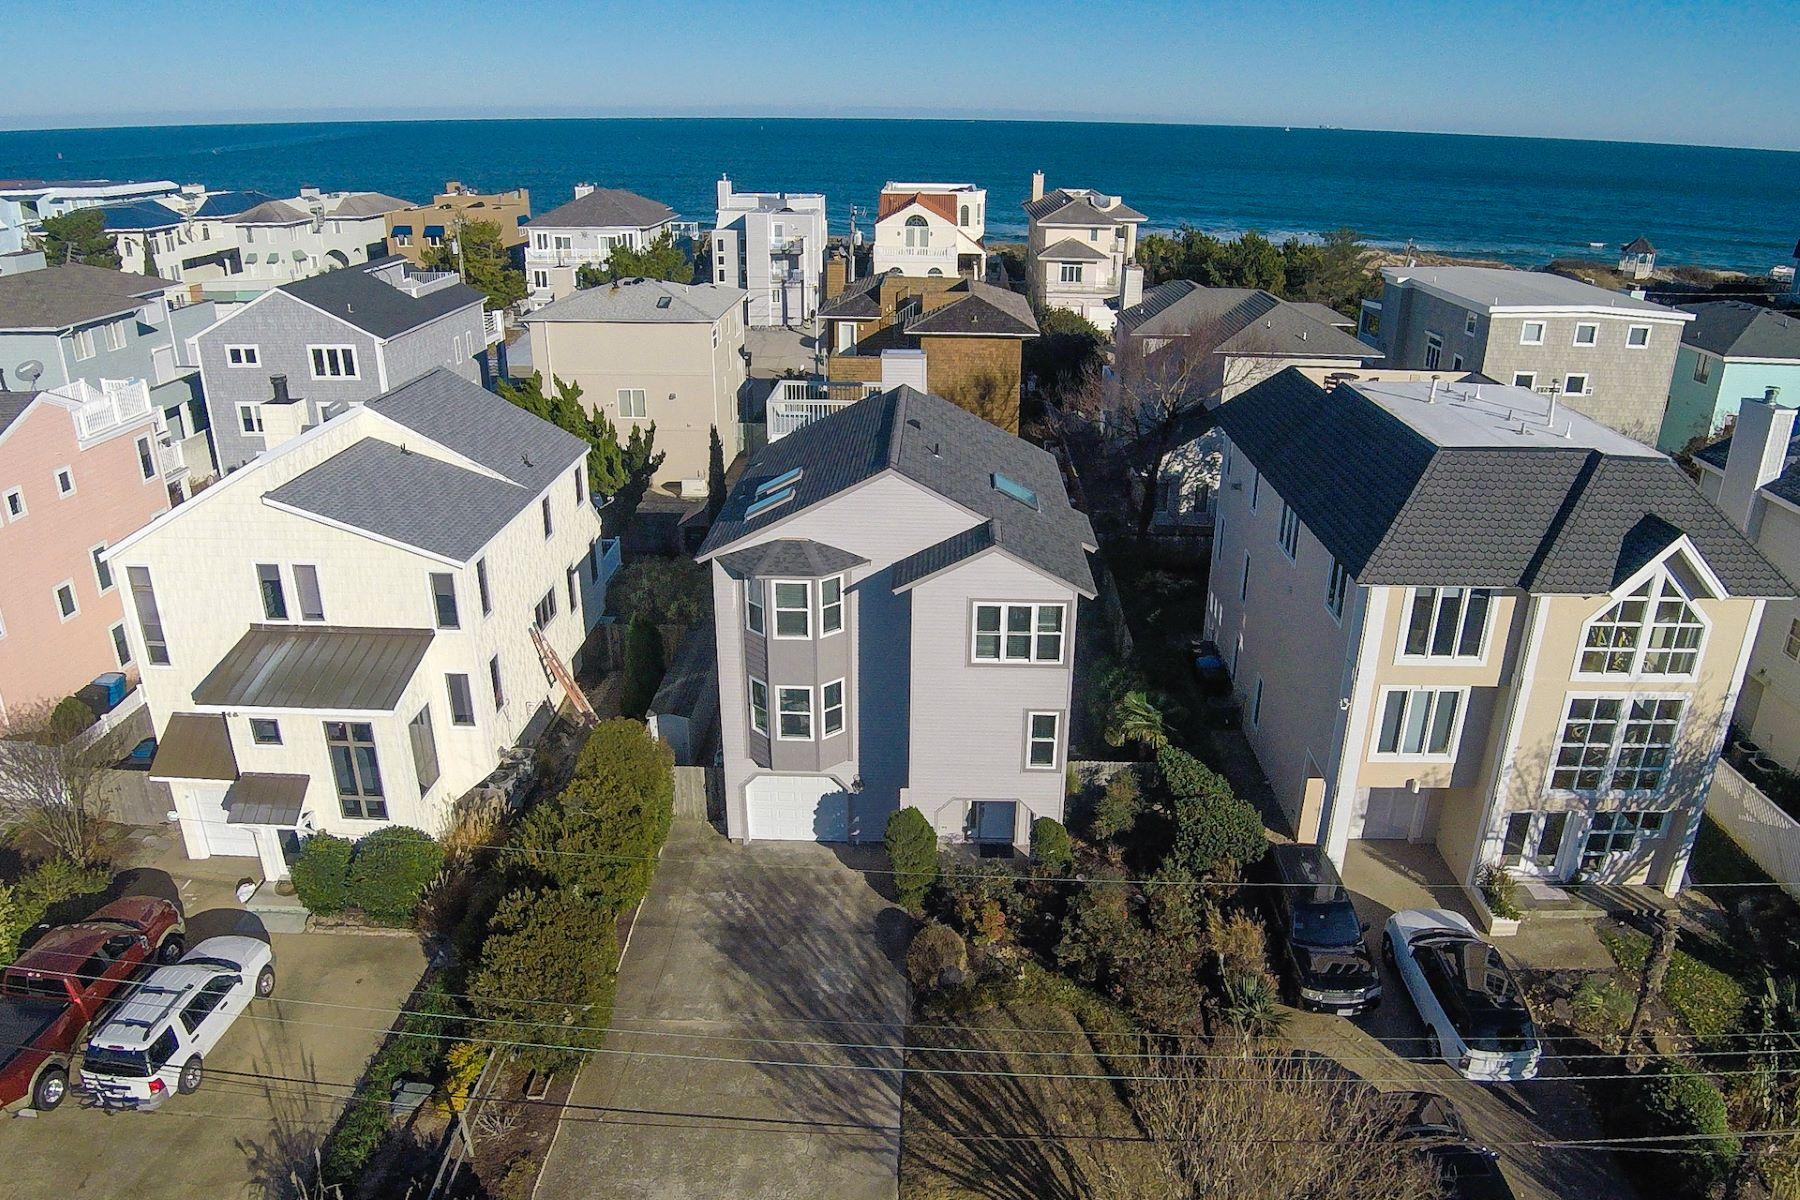 Single Family Homes for Active at Croatan 528 Vanderbilt Ave Virginia Beach, Virginia 23451 United States